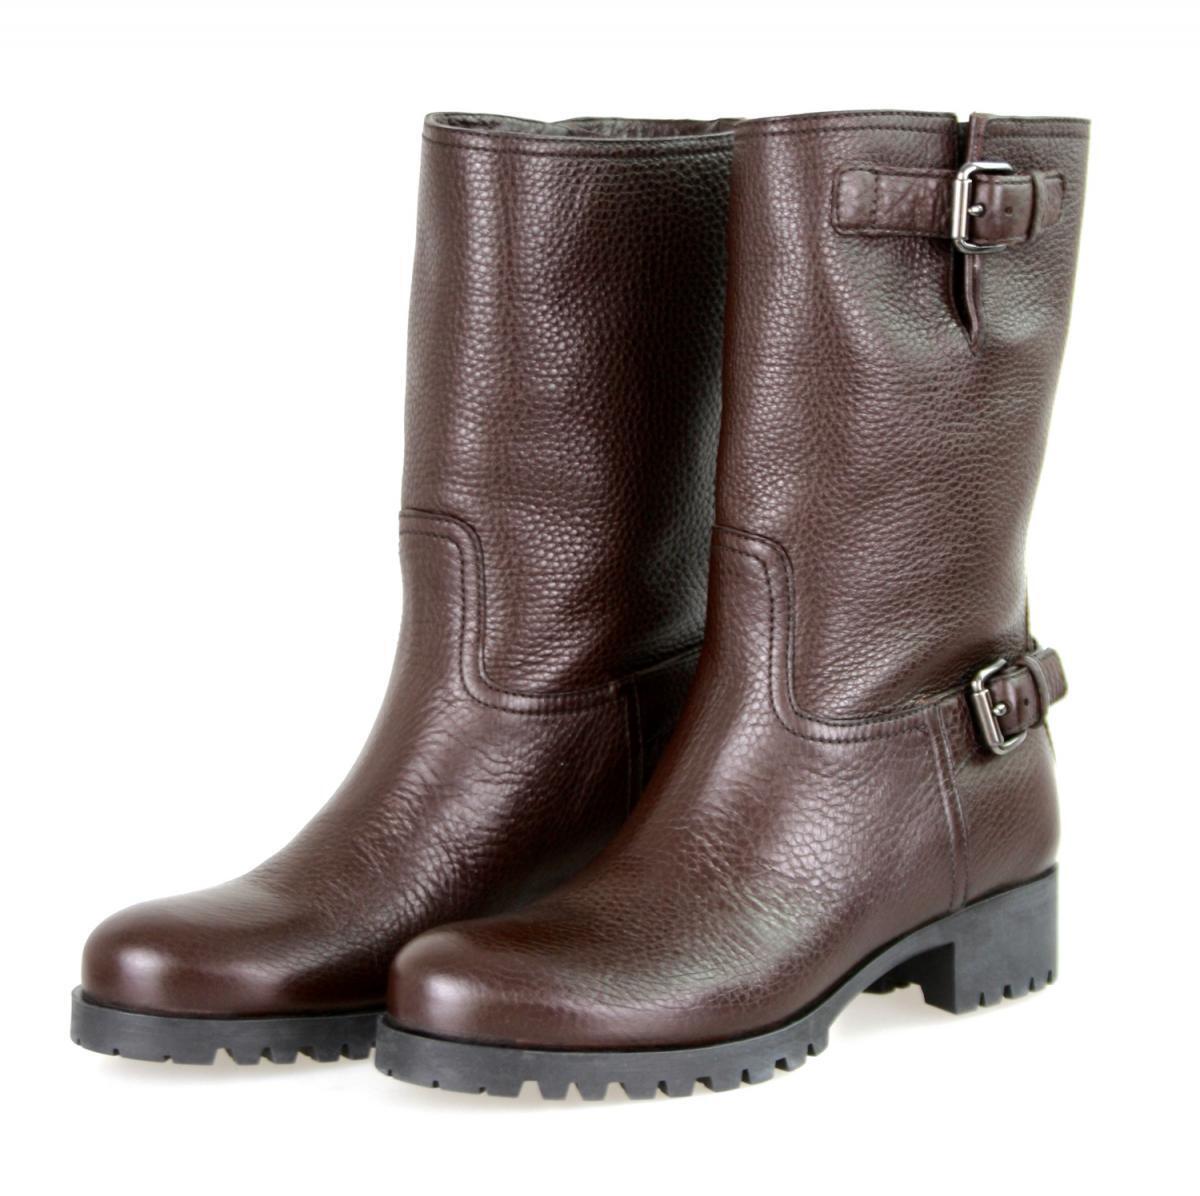 Lujo prada botín zapatos botas 3u5785 Caffe marrón nuevo 38,5 39